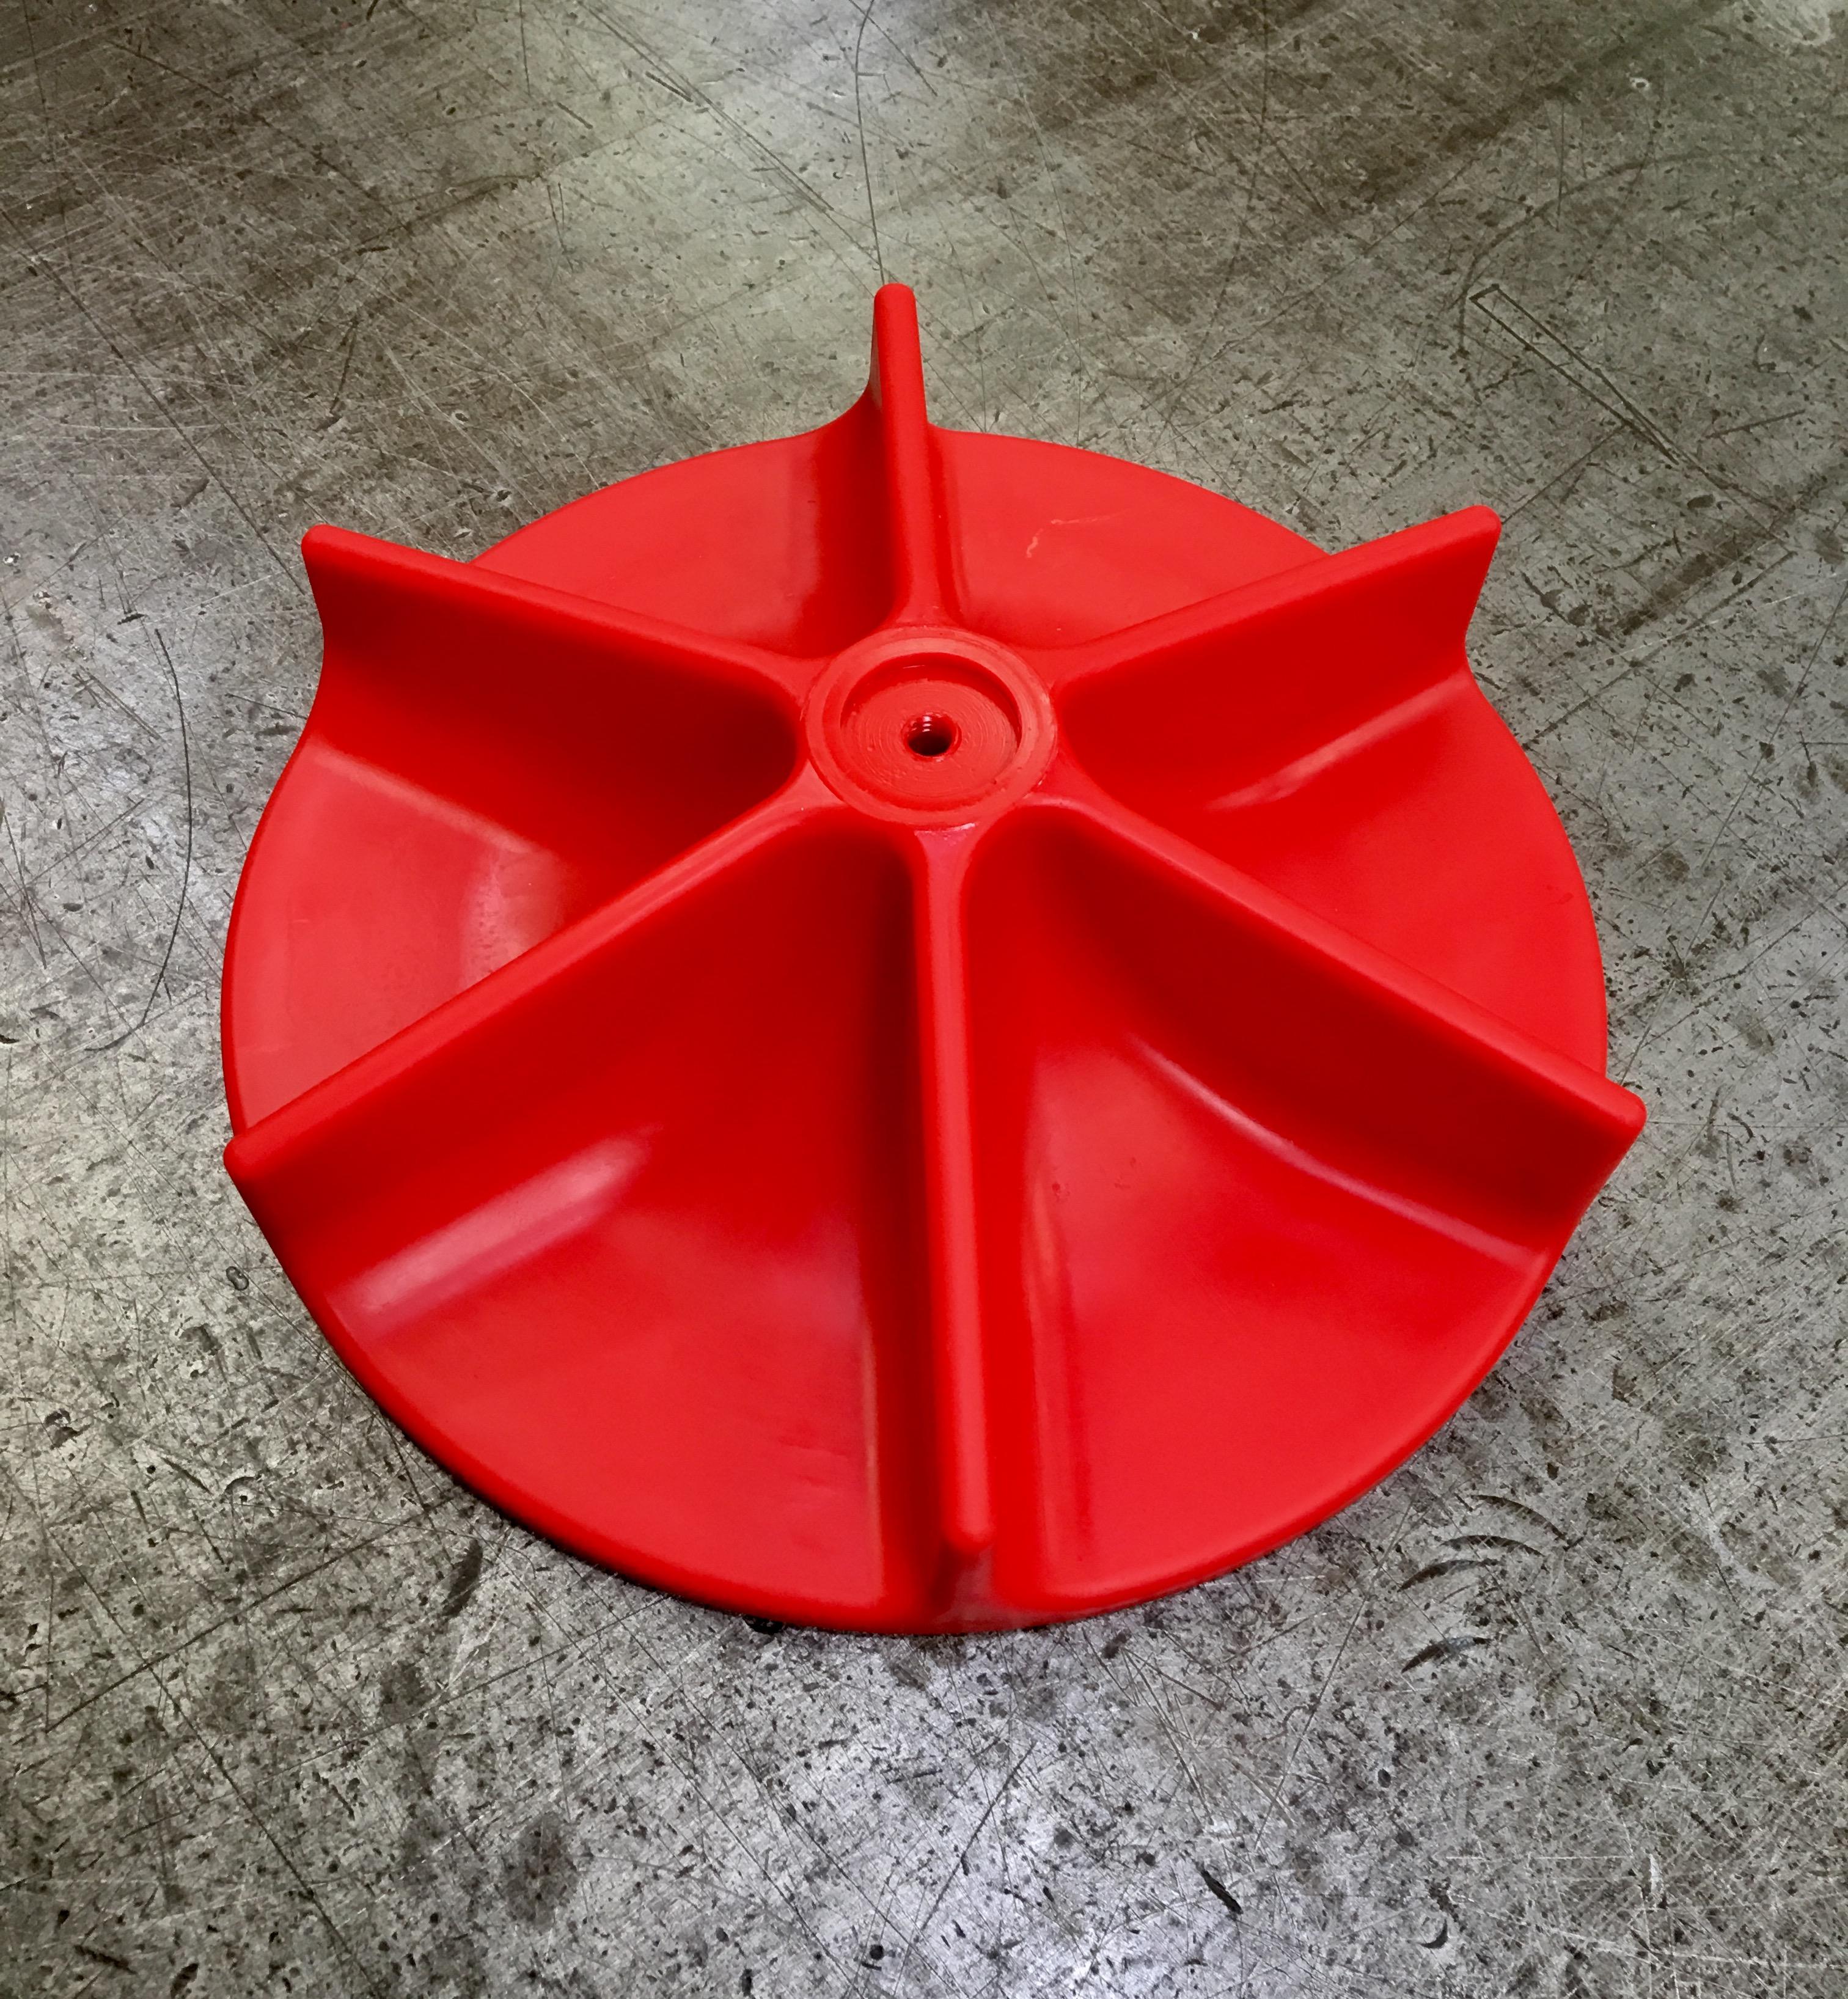 CNC cut polyurethane impeller